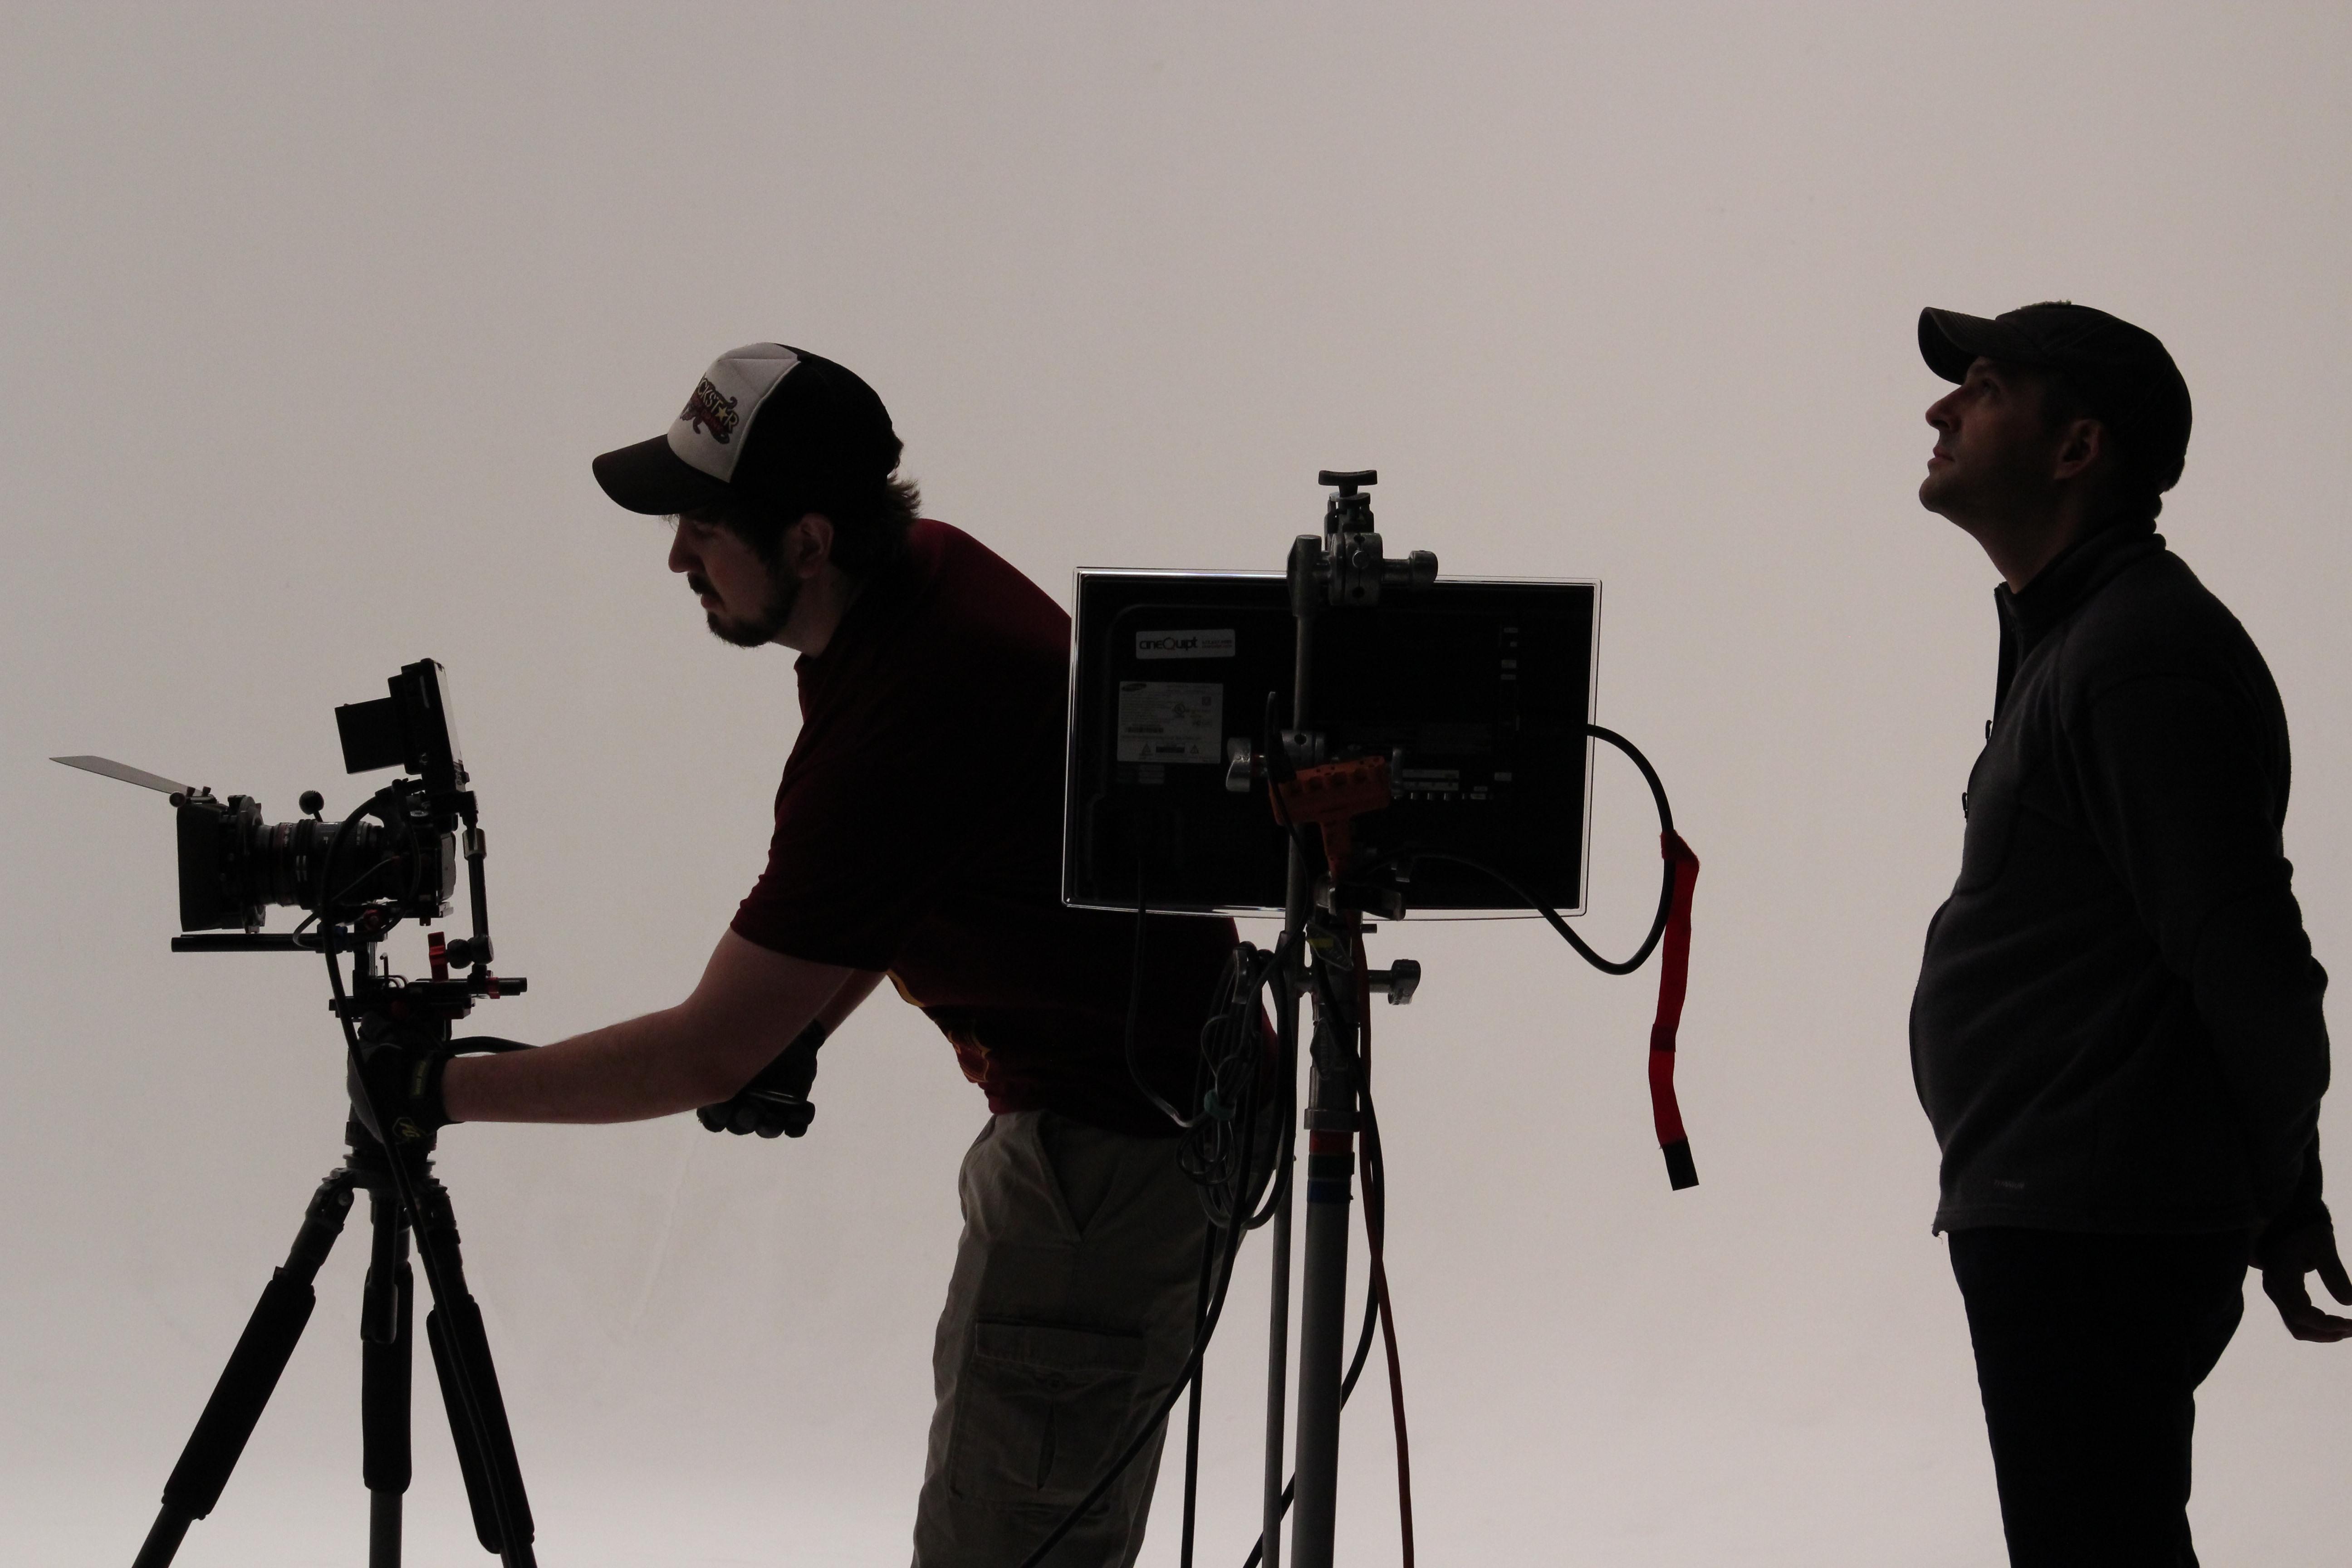 Black And White Flower Wallpaper Free Stock Photo Of Film Crew On Set In Studio